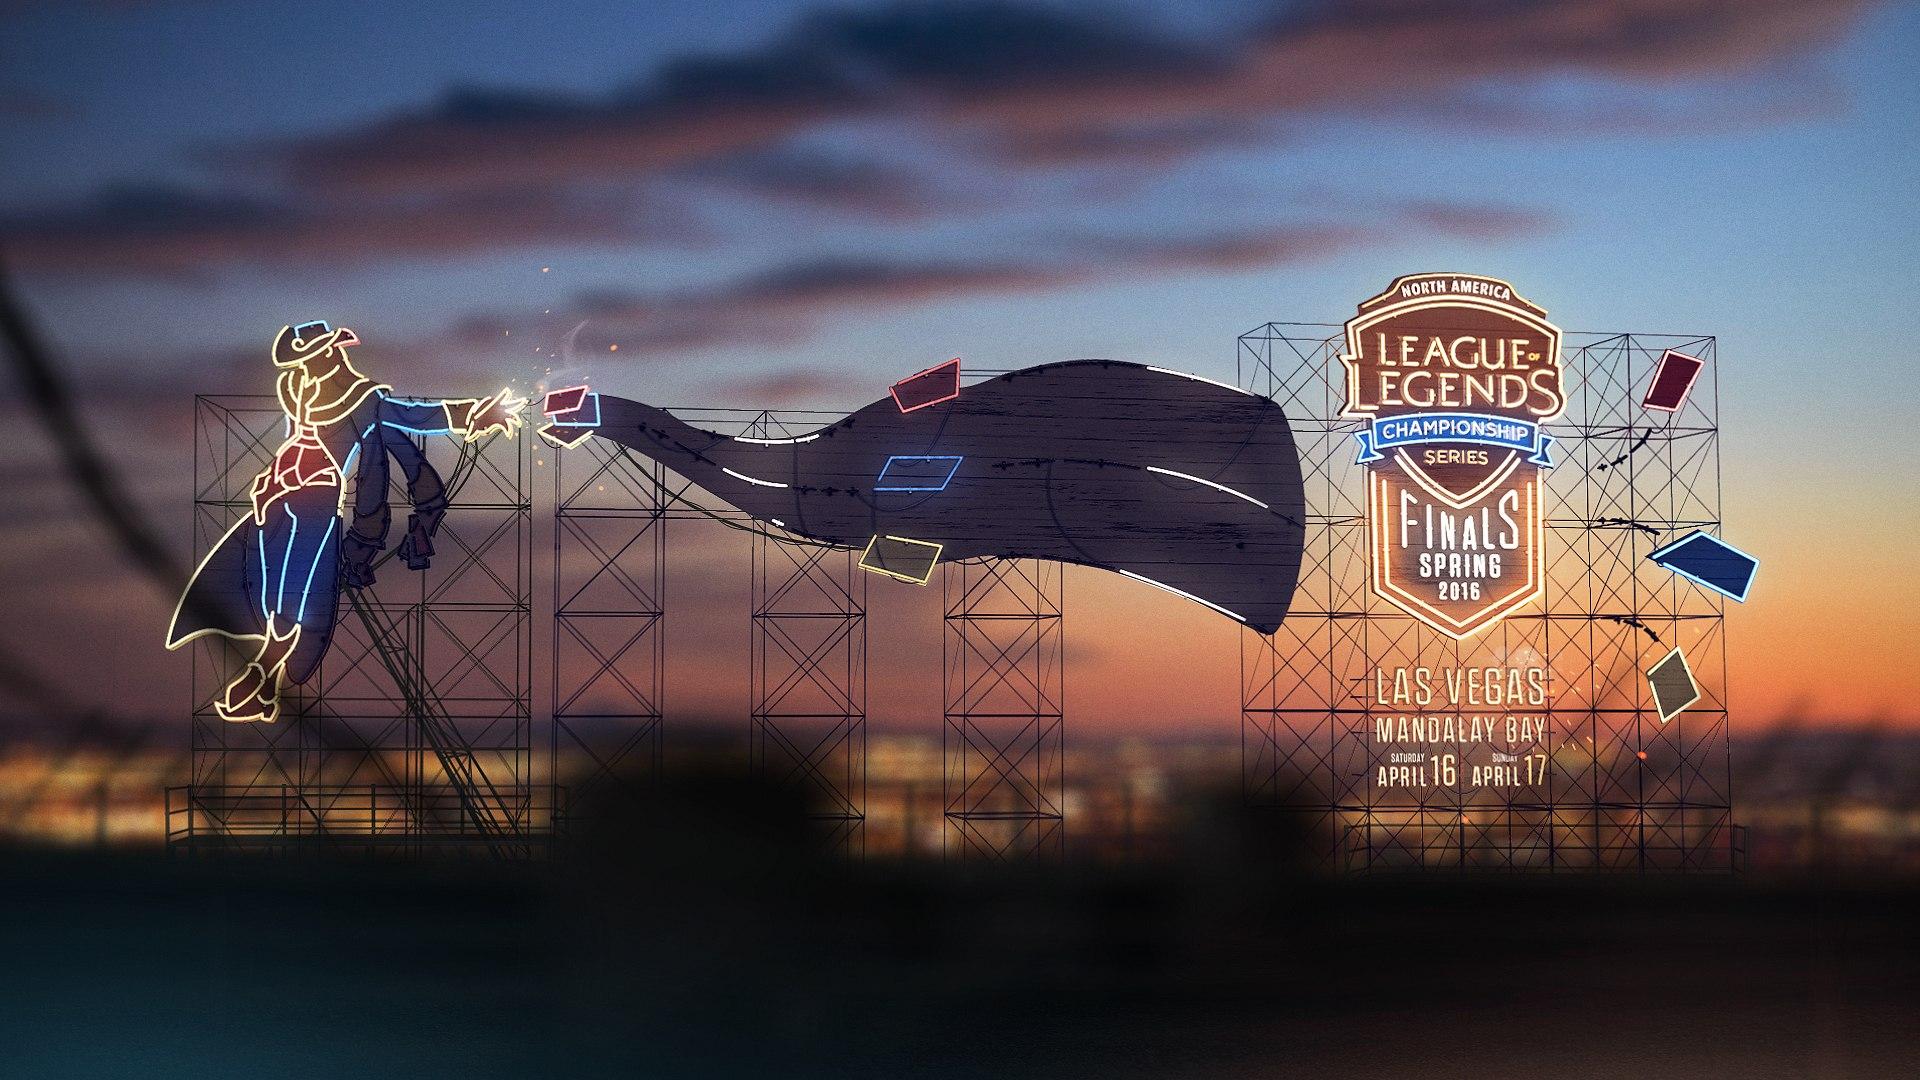 Viva Las Vegas - NA LCS Spring Finals heading to Vegas